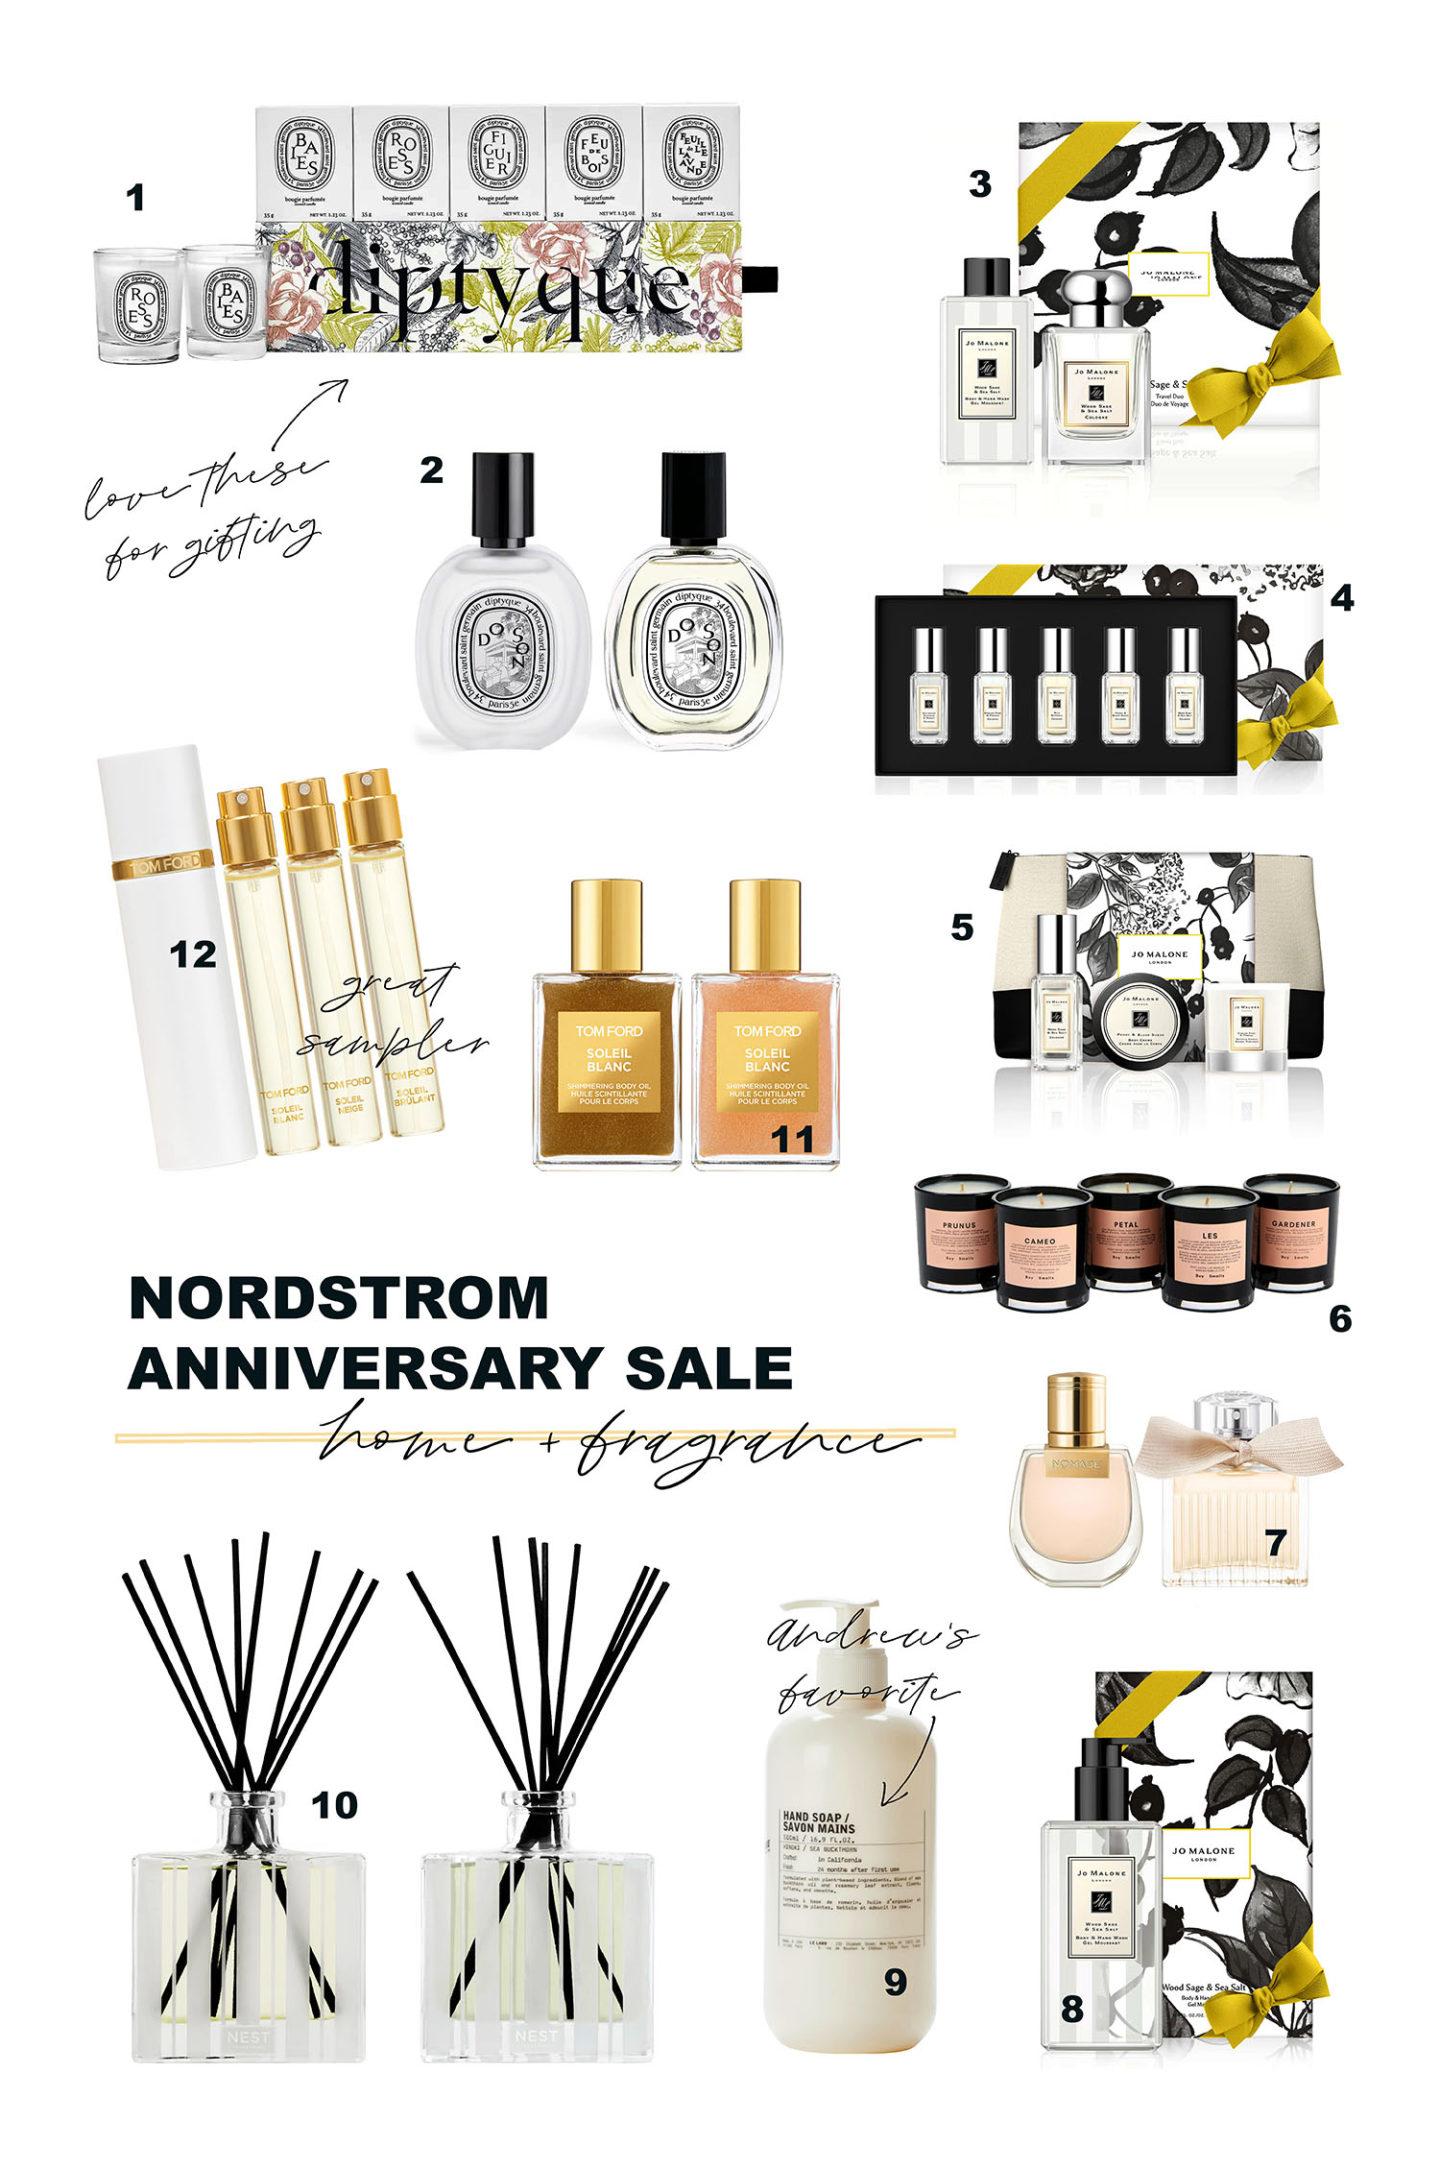 Nordstrom Anniversary Sale 2021 Beauty Exclusives Parfum